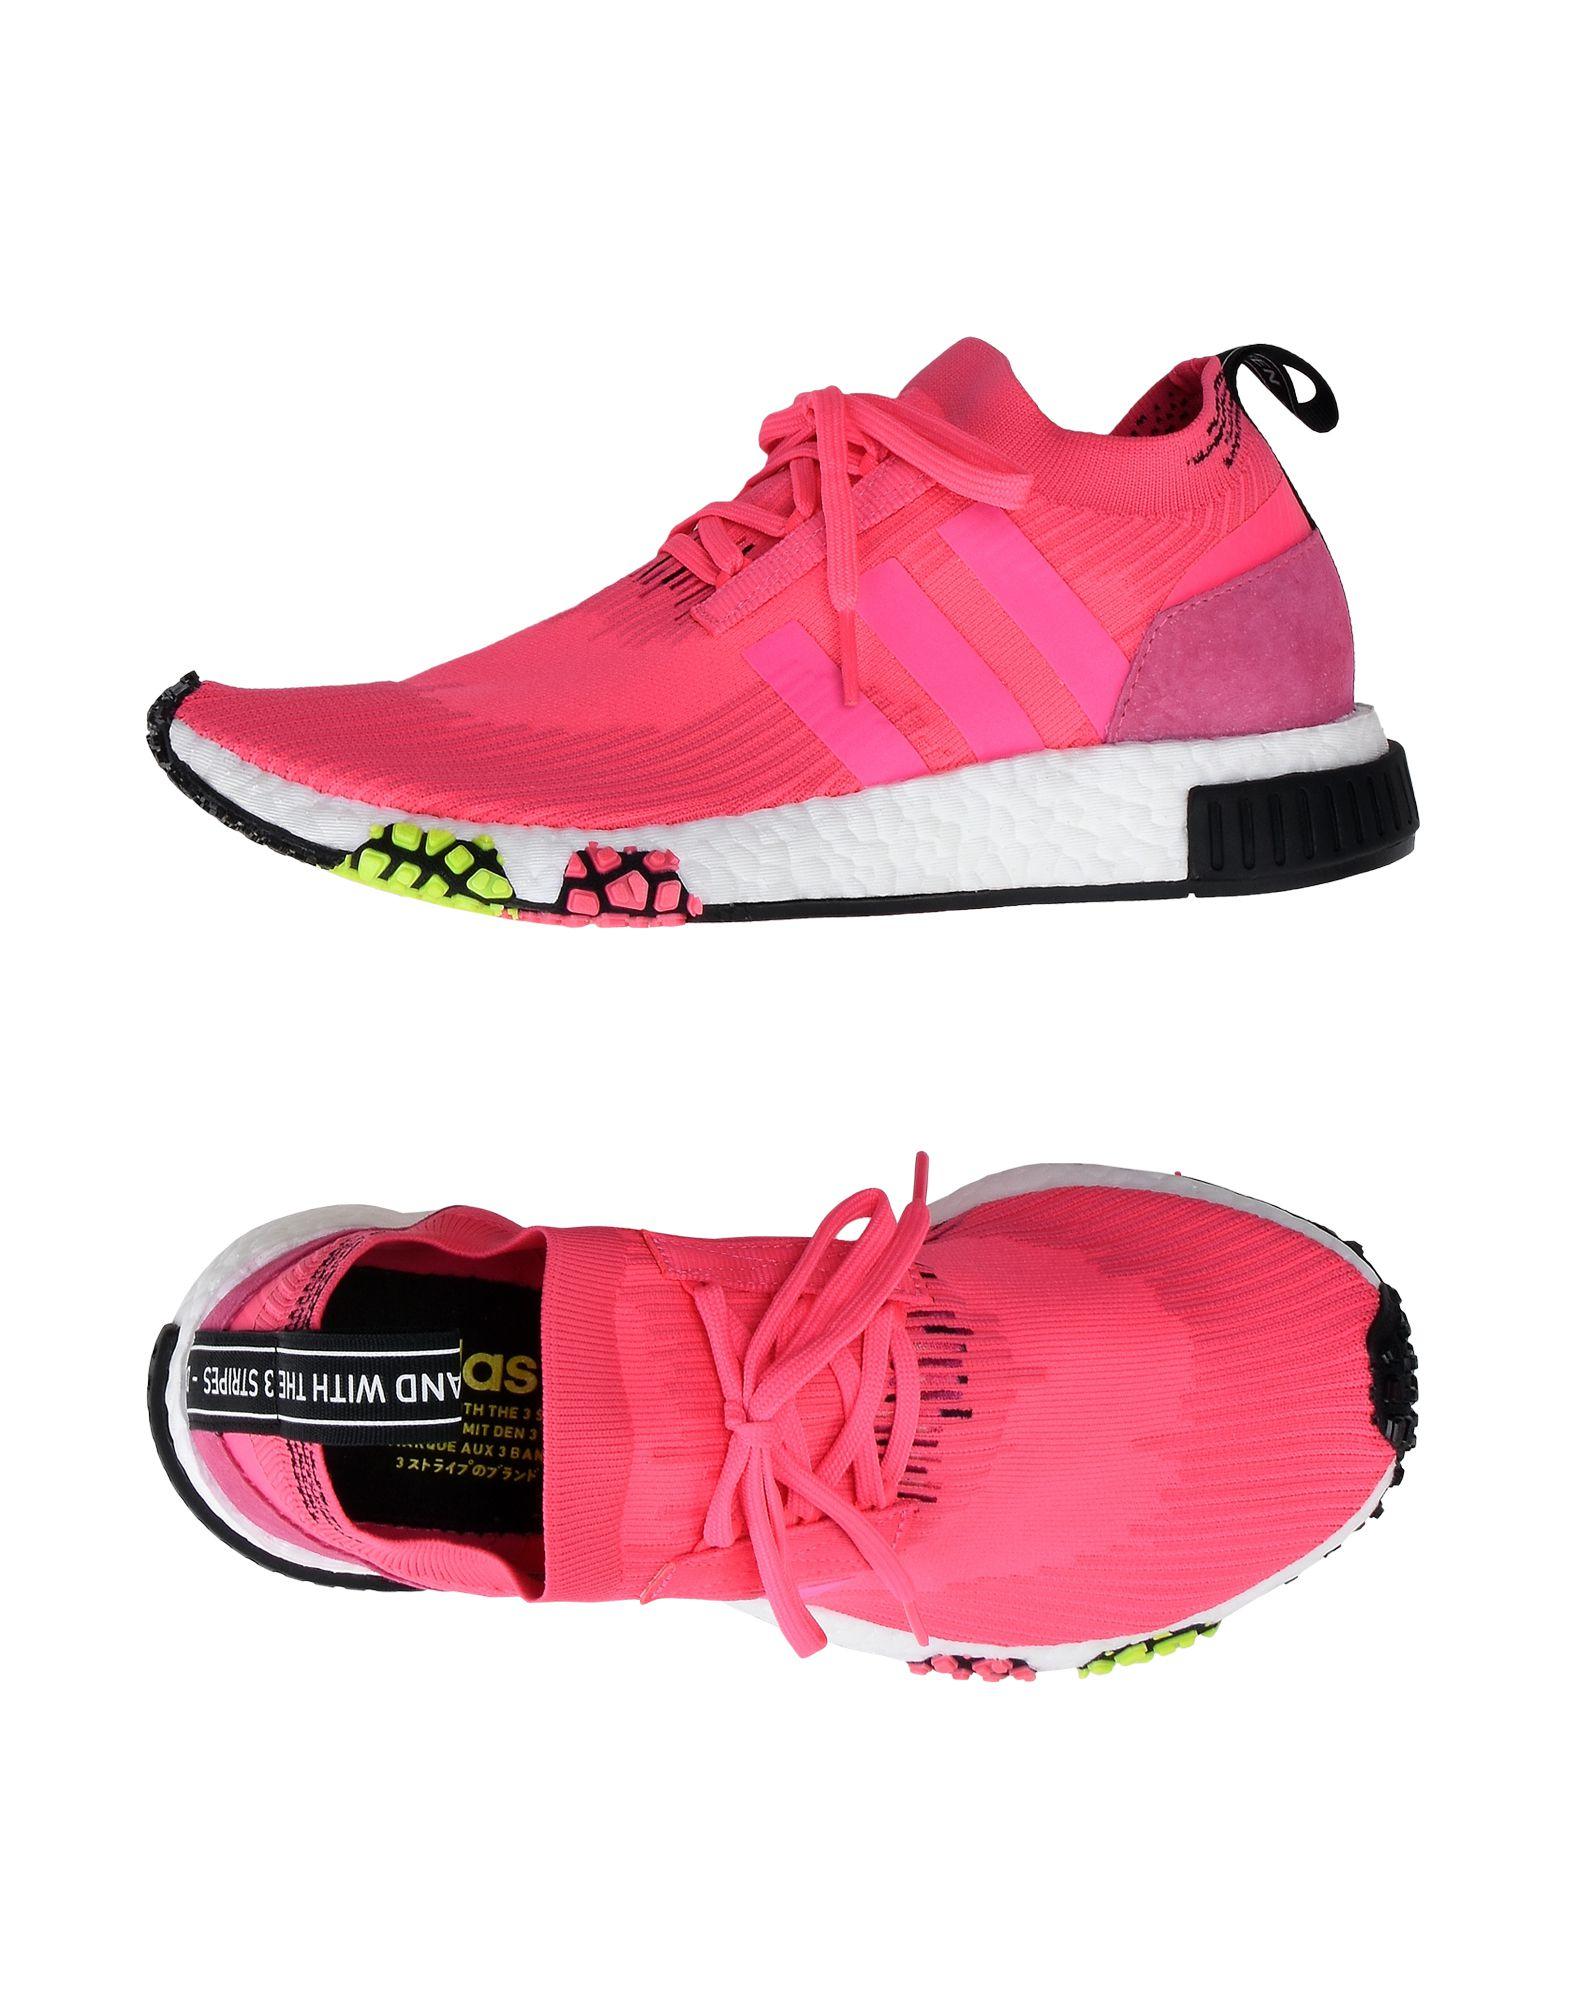 Adidas Originals Nmd_Racer Pk - Sneakers - Women on Adidas Originals Sneakers online on Women  United Kingdom - 11439887EG fd3146